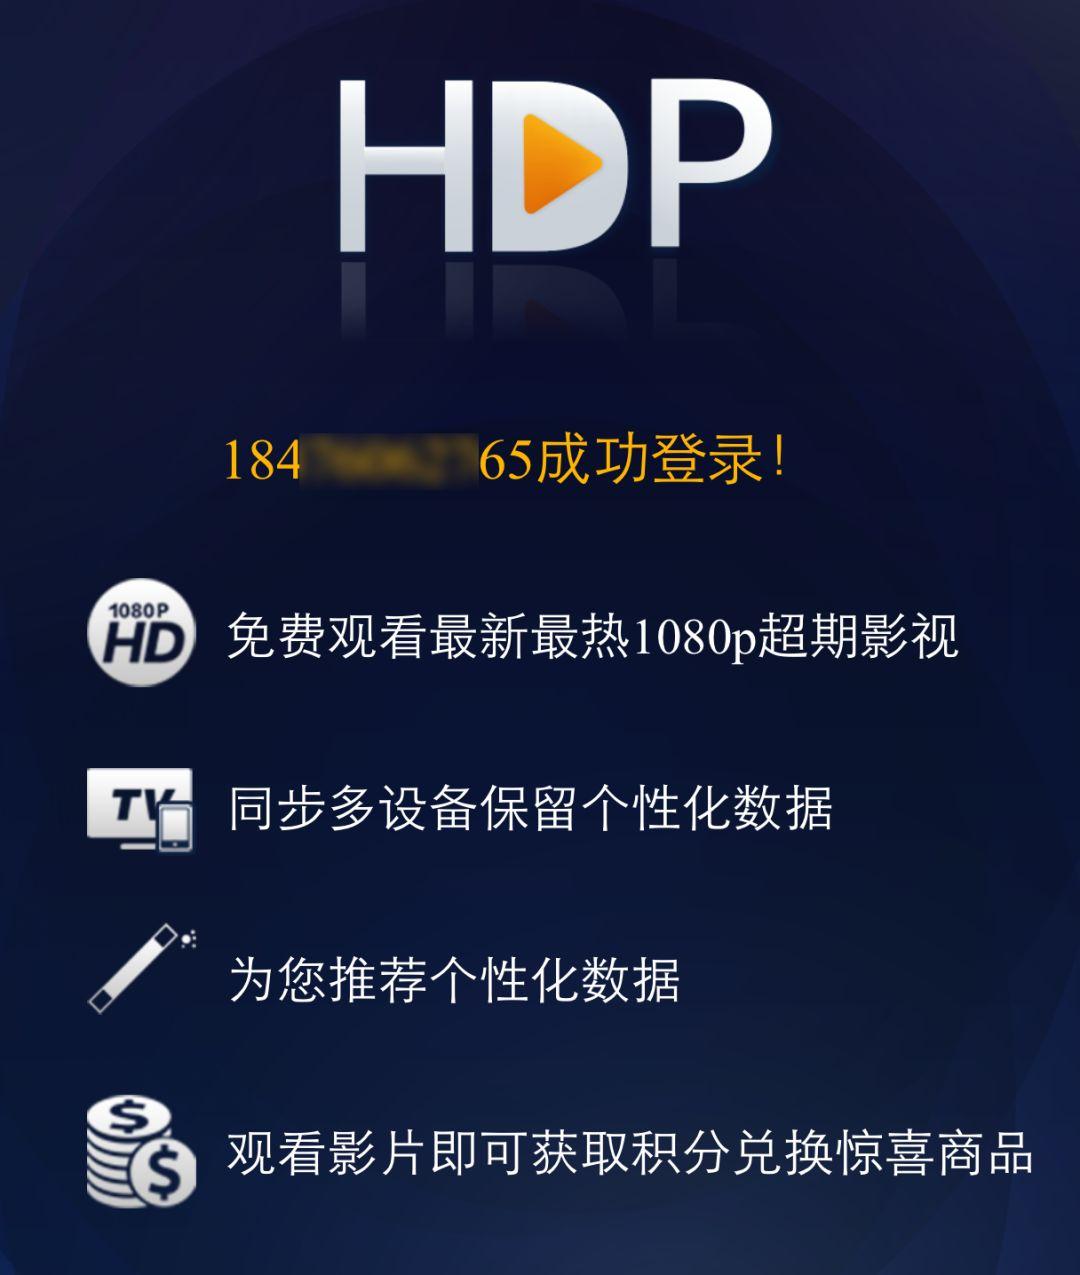 【HDP 直播】VIP超清央视卫视等网络电视直播软件(支持盒子)